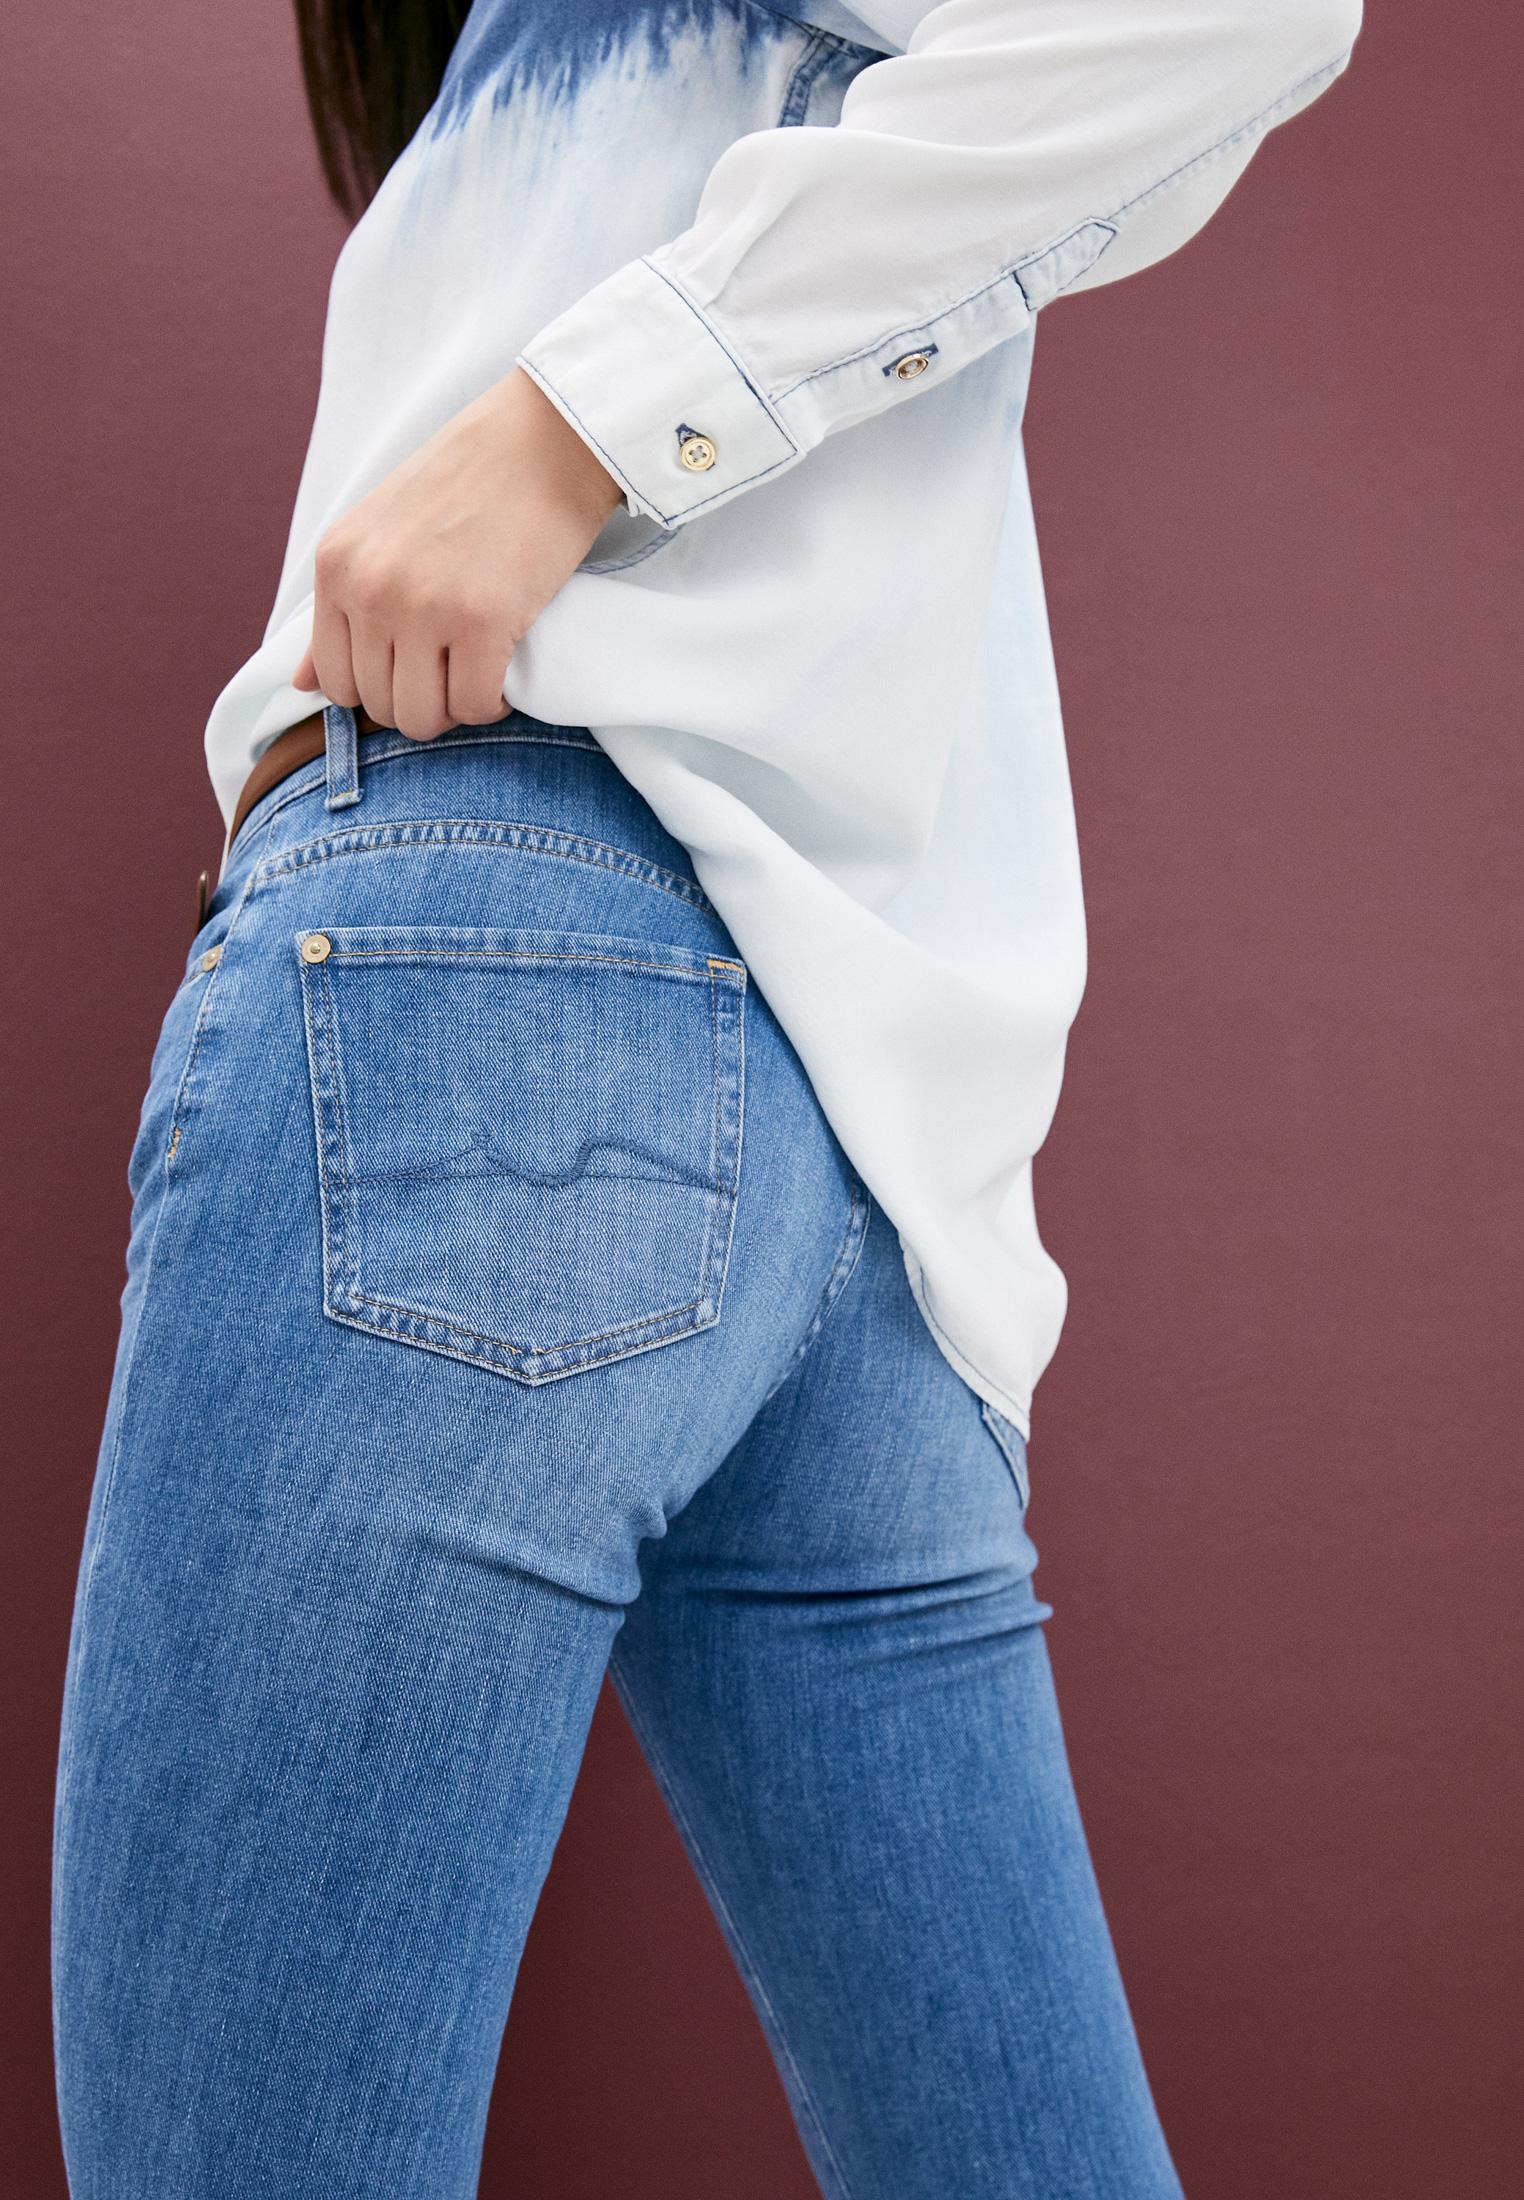 Зауженные джинсы 7 For All Mankind (7 Фо Олл Мэнкайнд) JSVYR51TRT: изображение 2